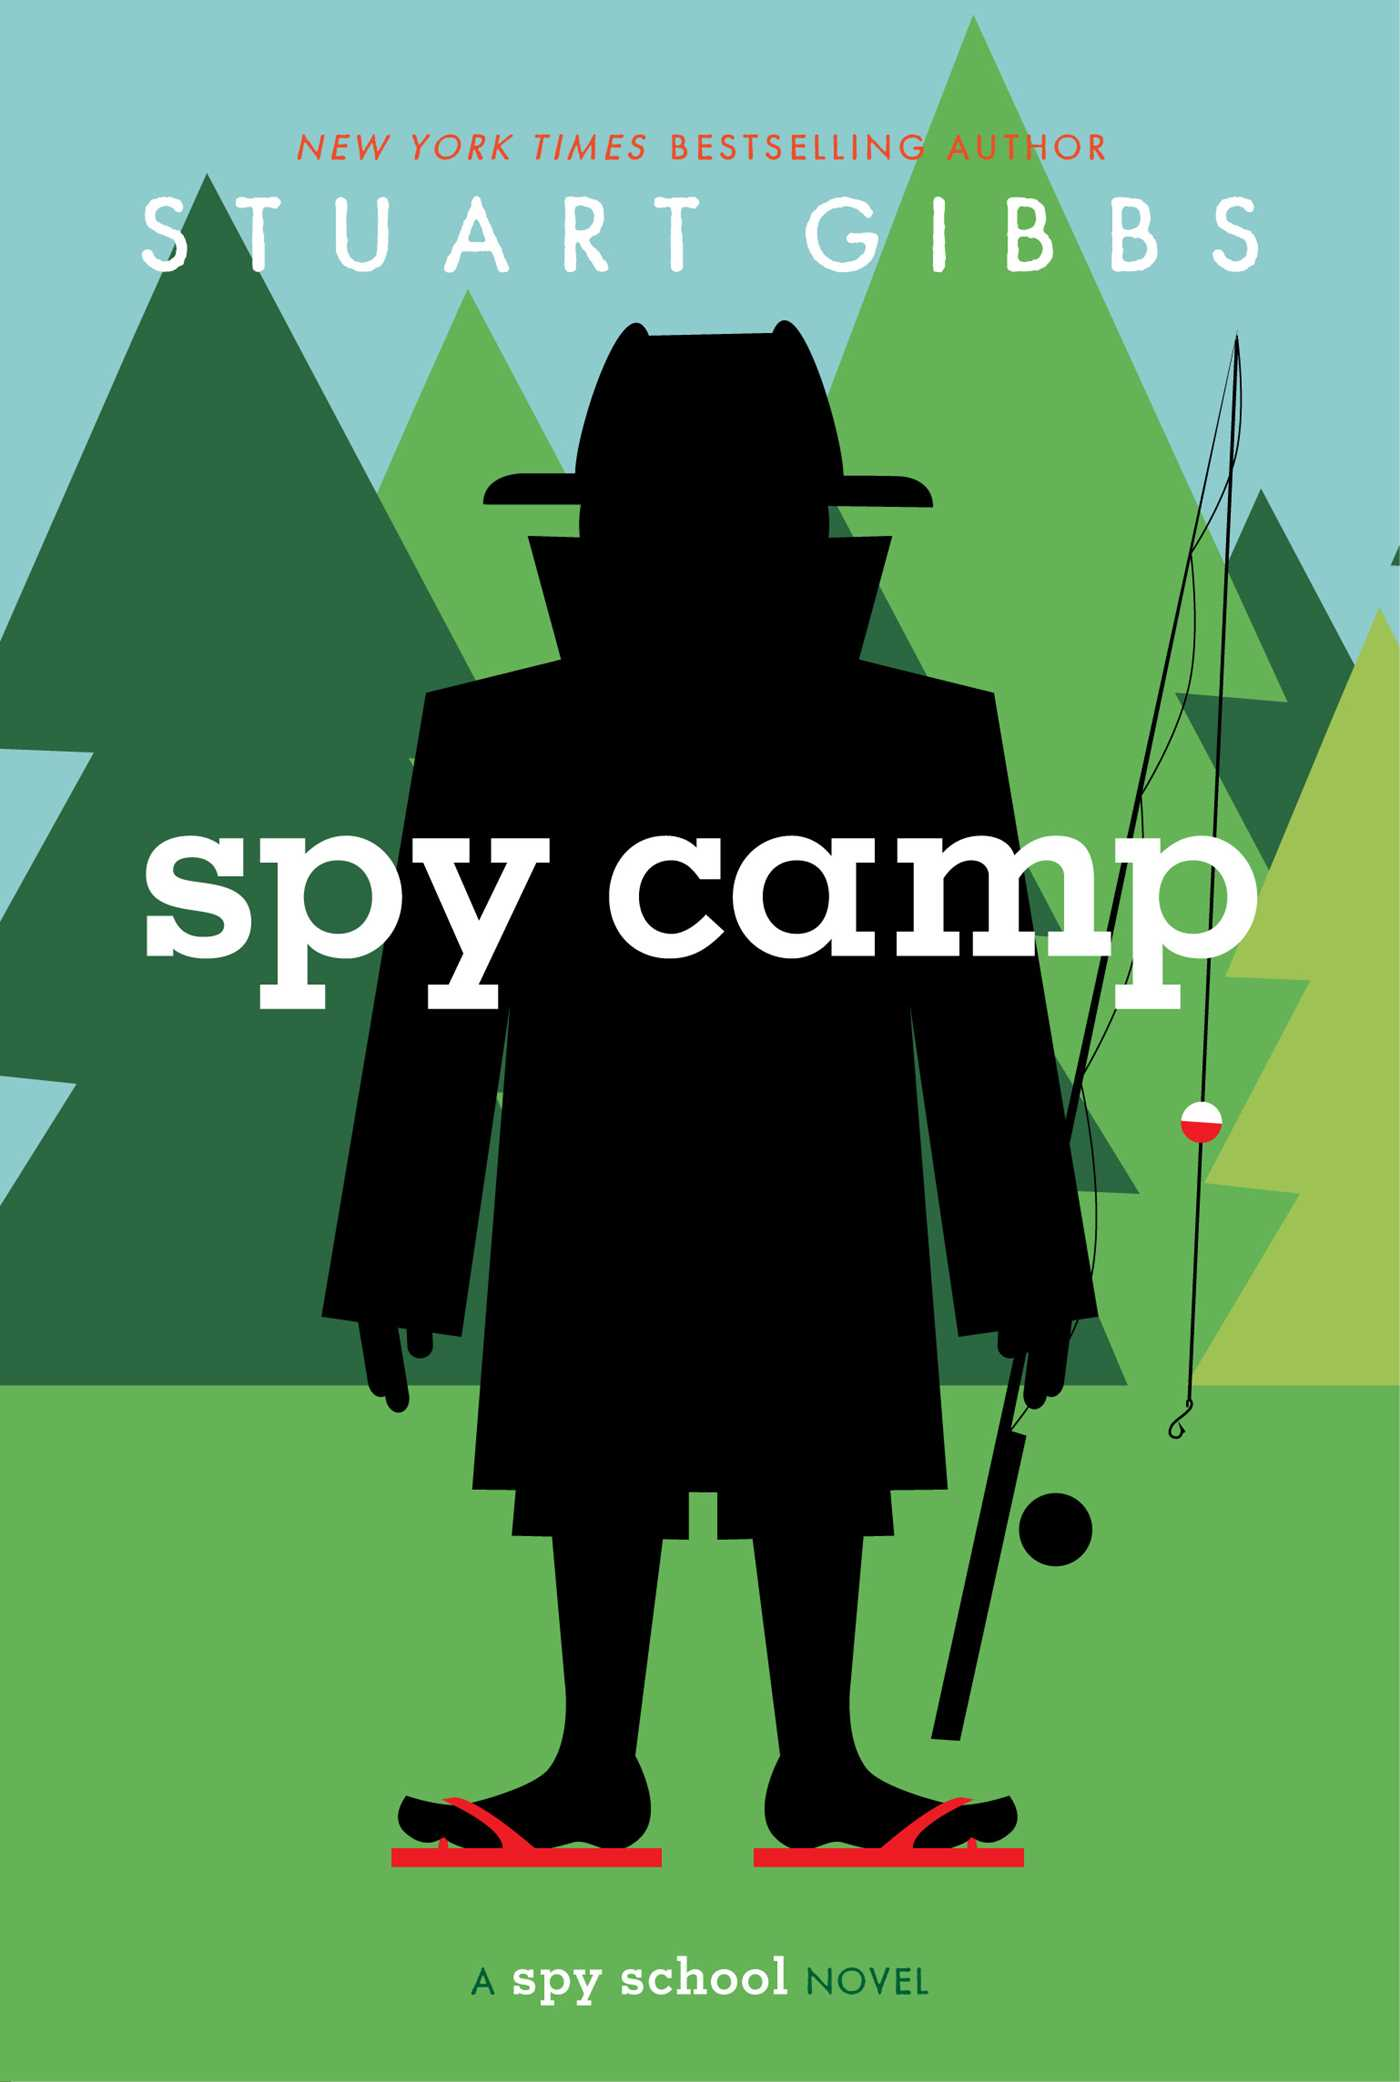 Spy camp 9781442457546 hr